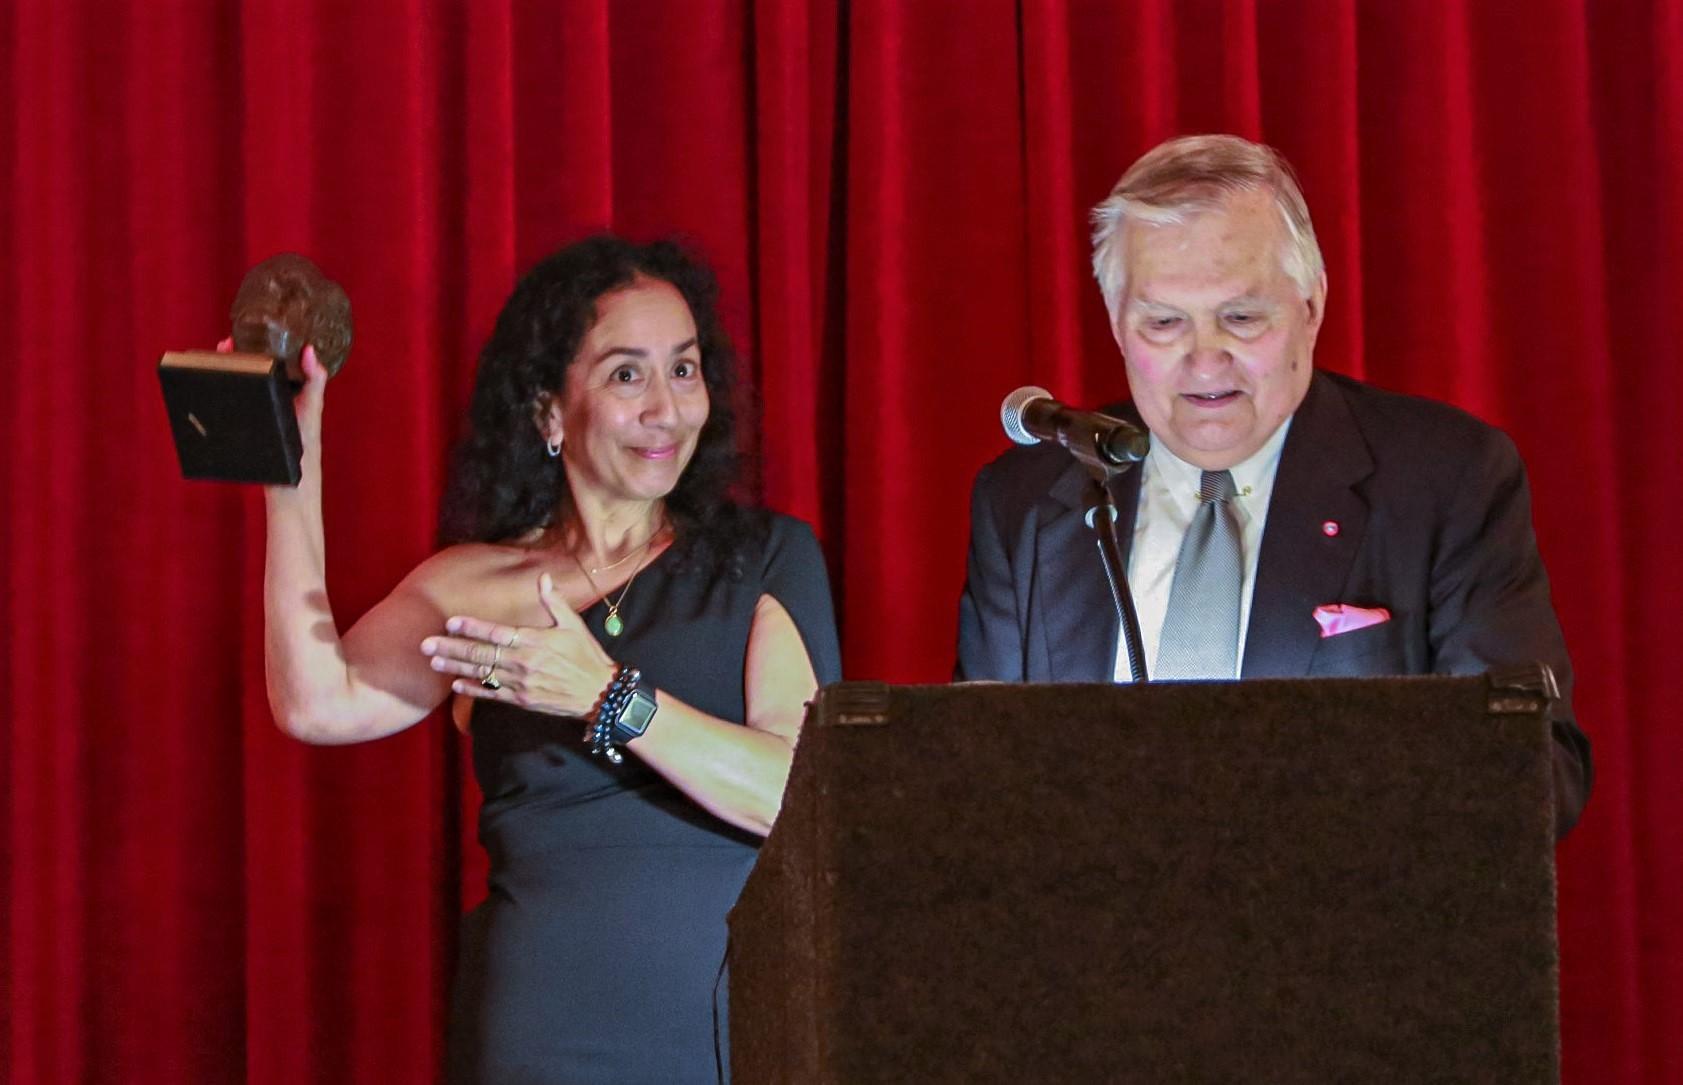 Karen accepting the Melvin Belli Award.